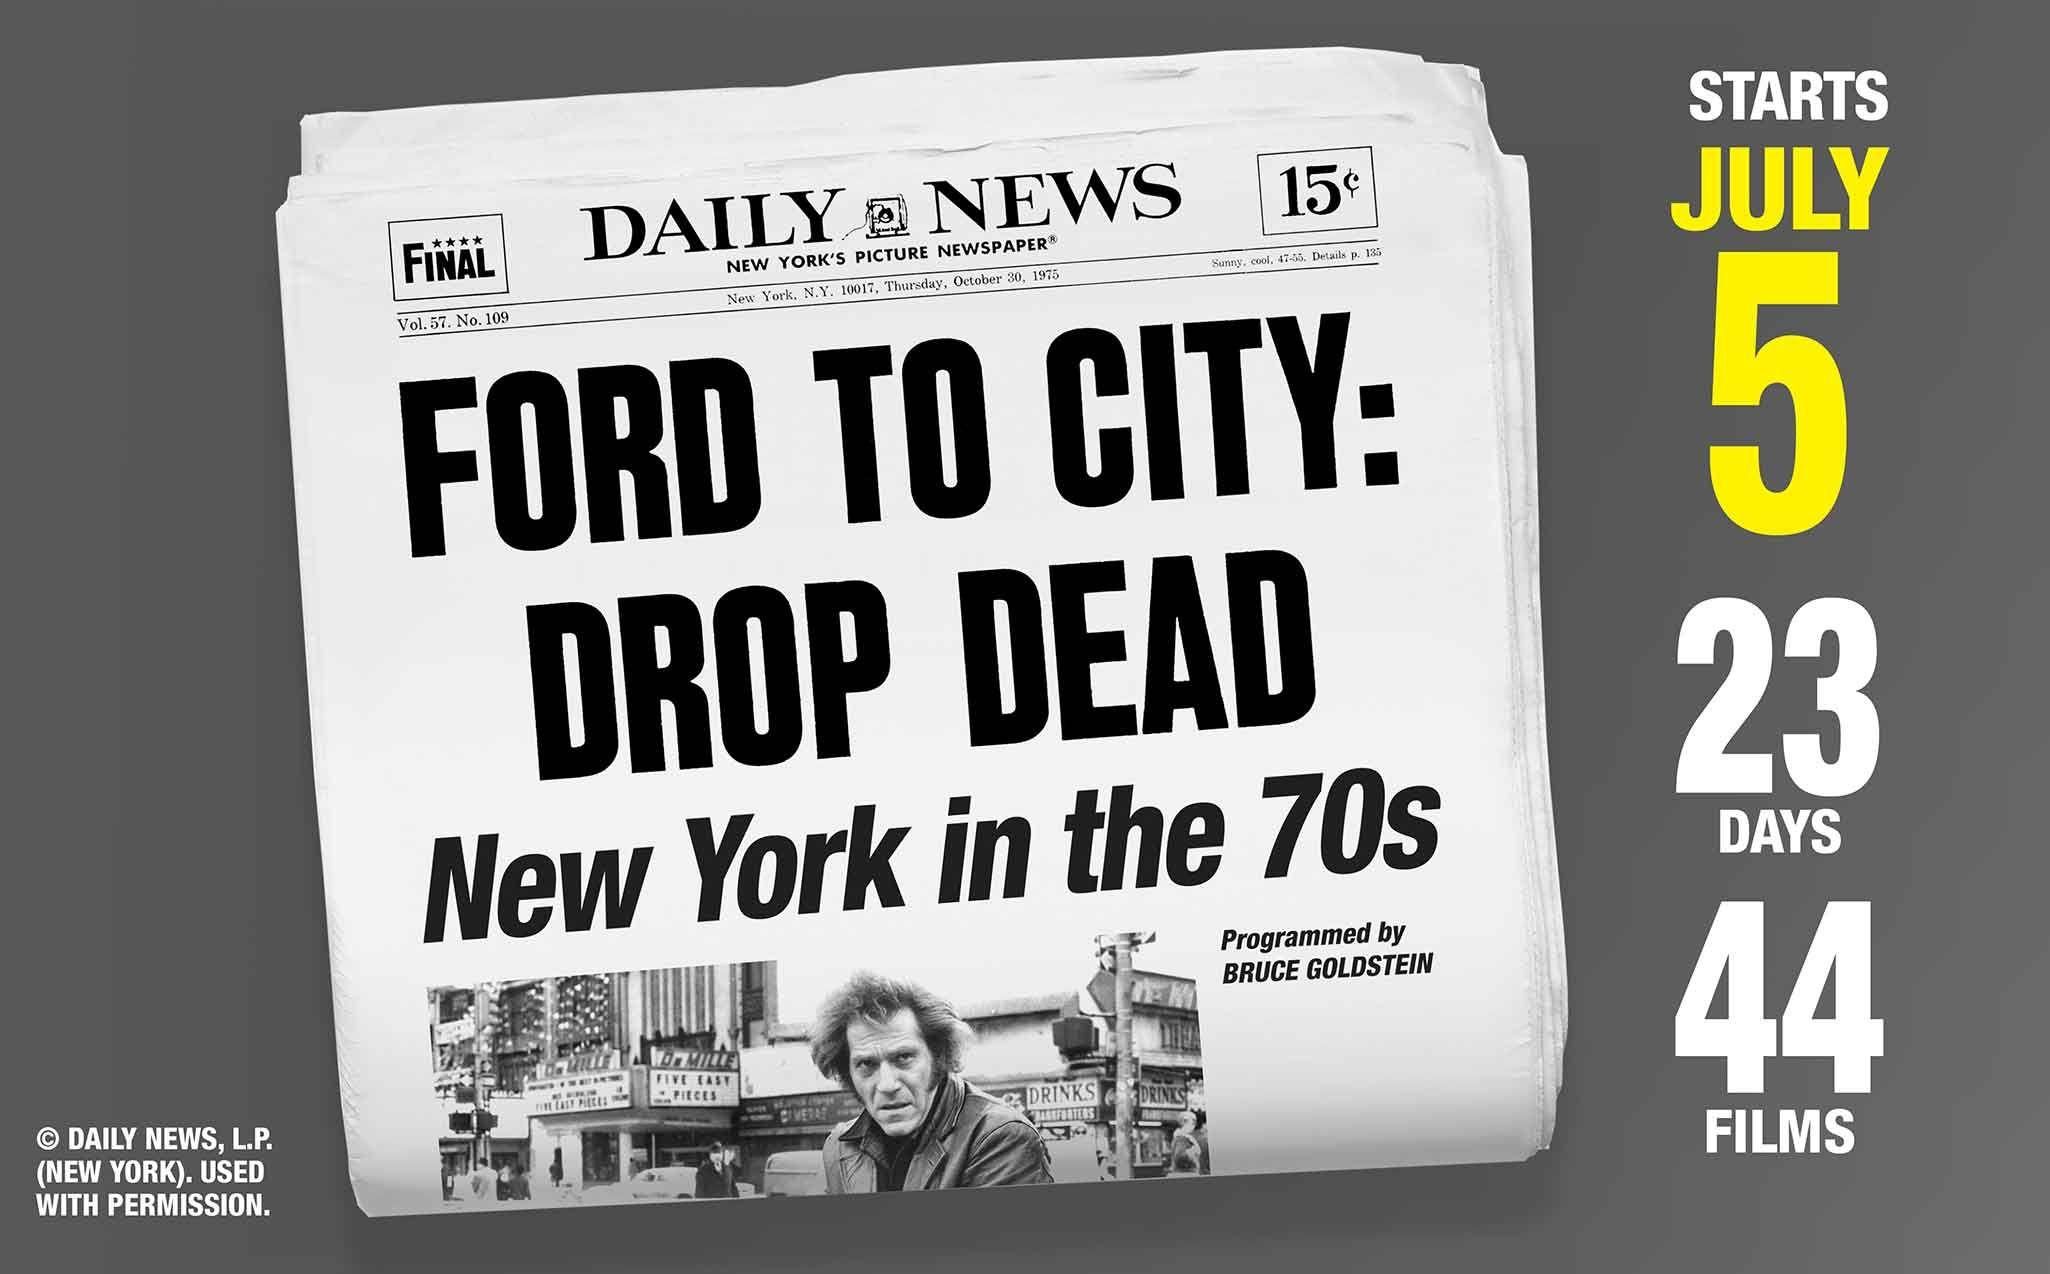 Film Forum Ford To City Drop Dead Lt Br X2f Gt New York